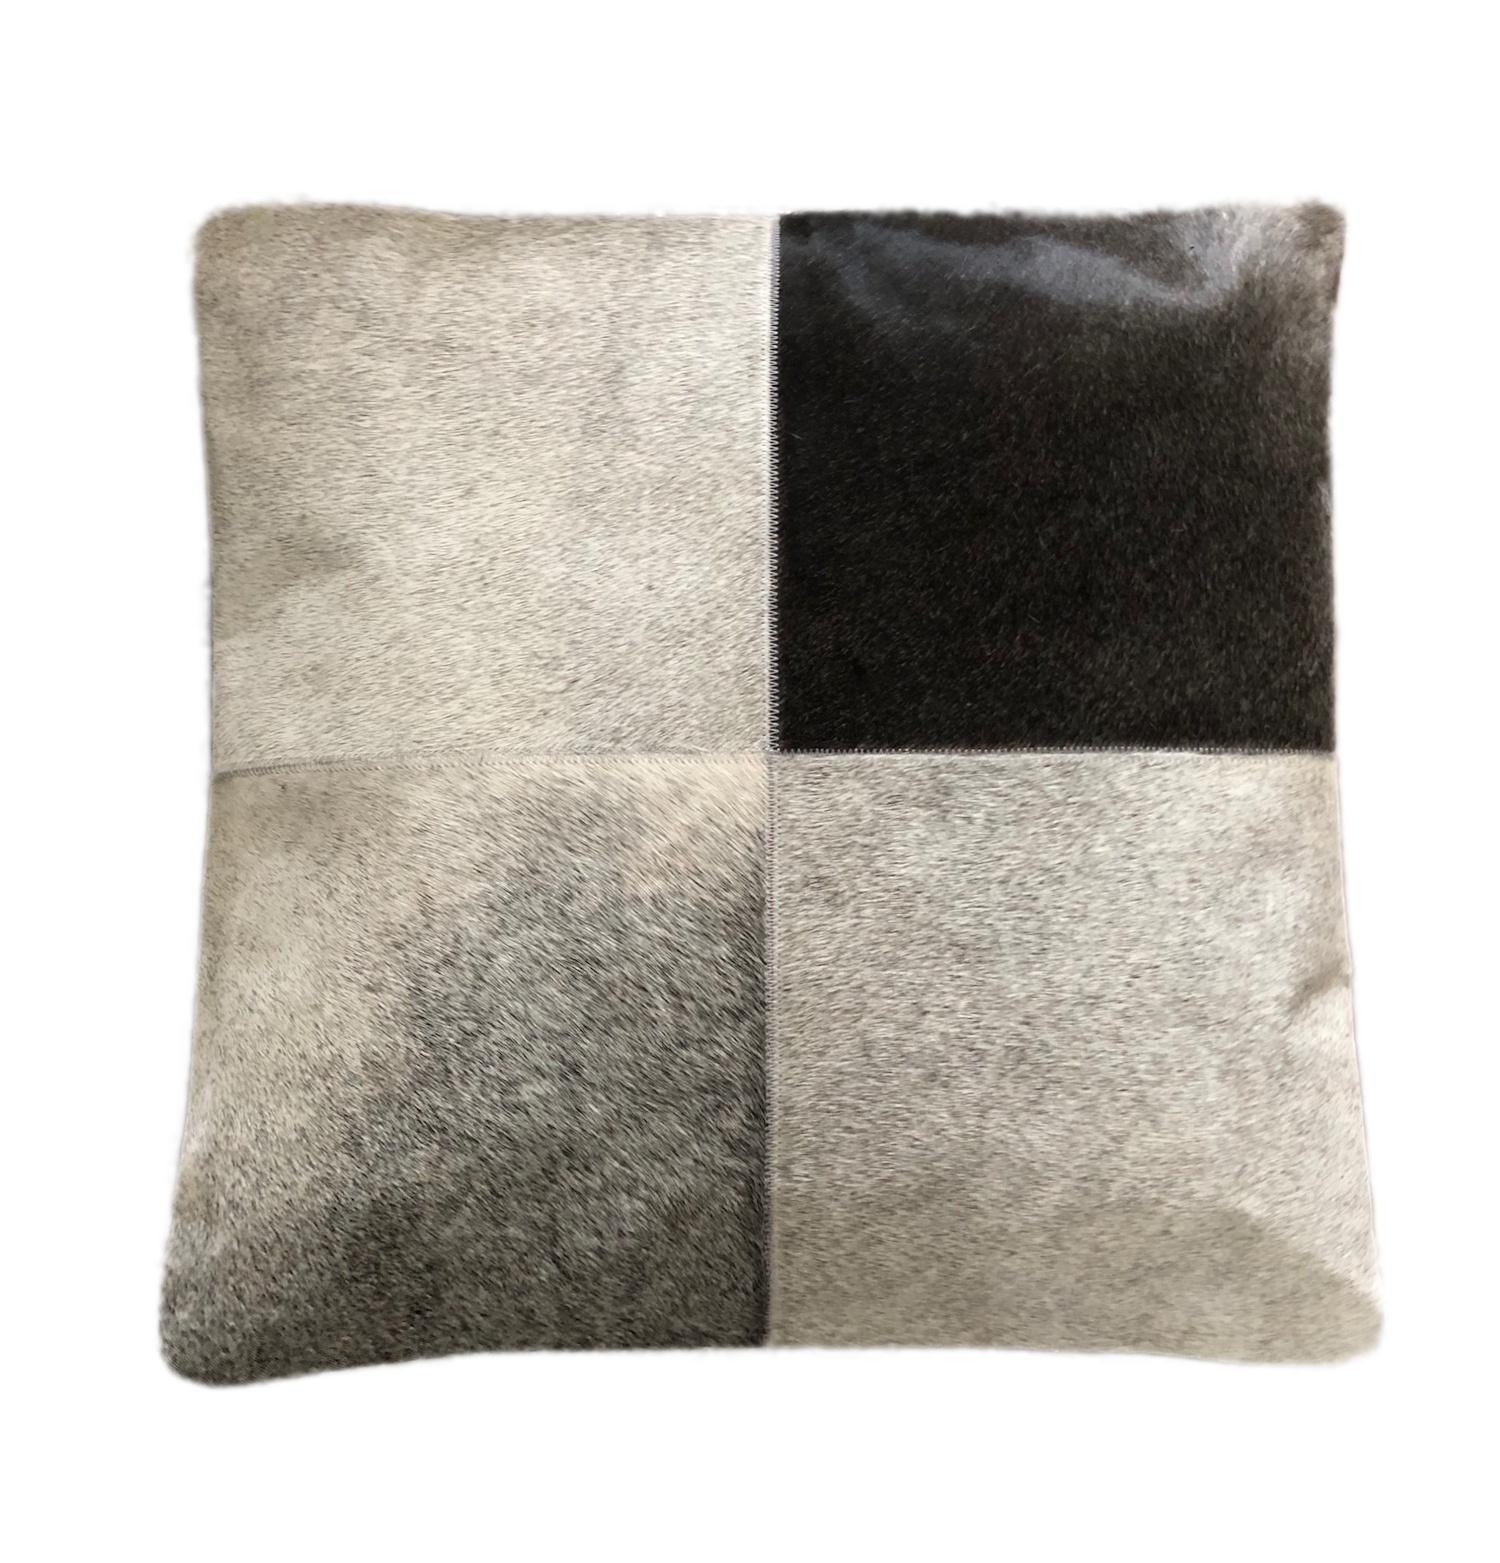 Edles Kuhfell Kissen Patchwork grau braun schwarz 60 cm – Flourou ...